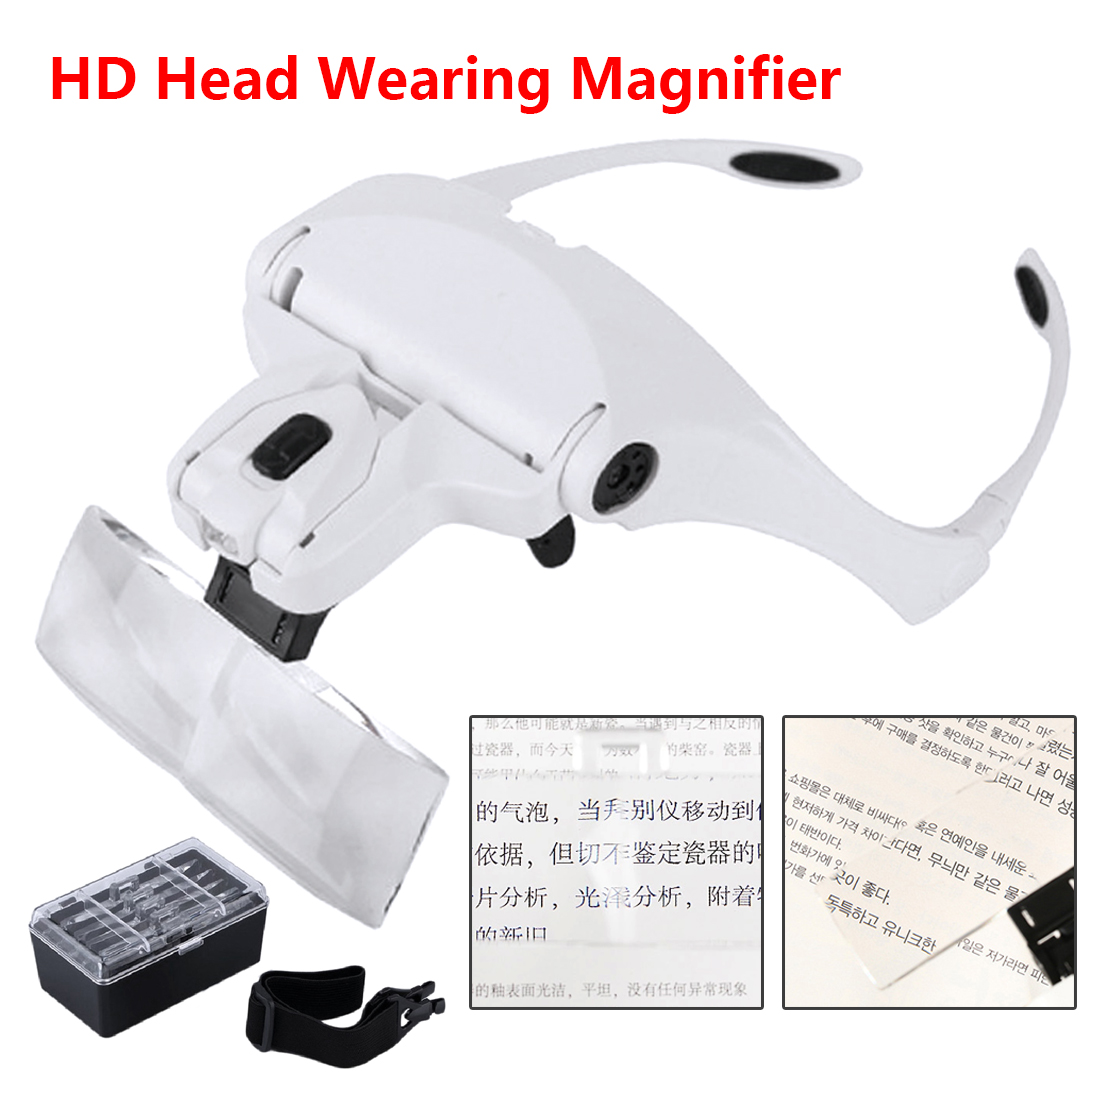 Gafas de lectura lupa 1,0X1,5X2,0X3,5X2,5X5 lentes auriculares gafas ajustables lupa para costura